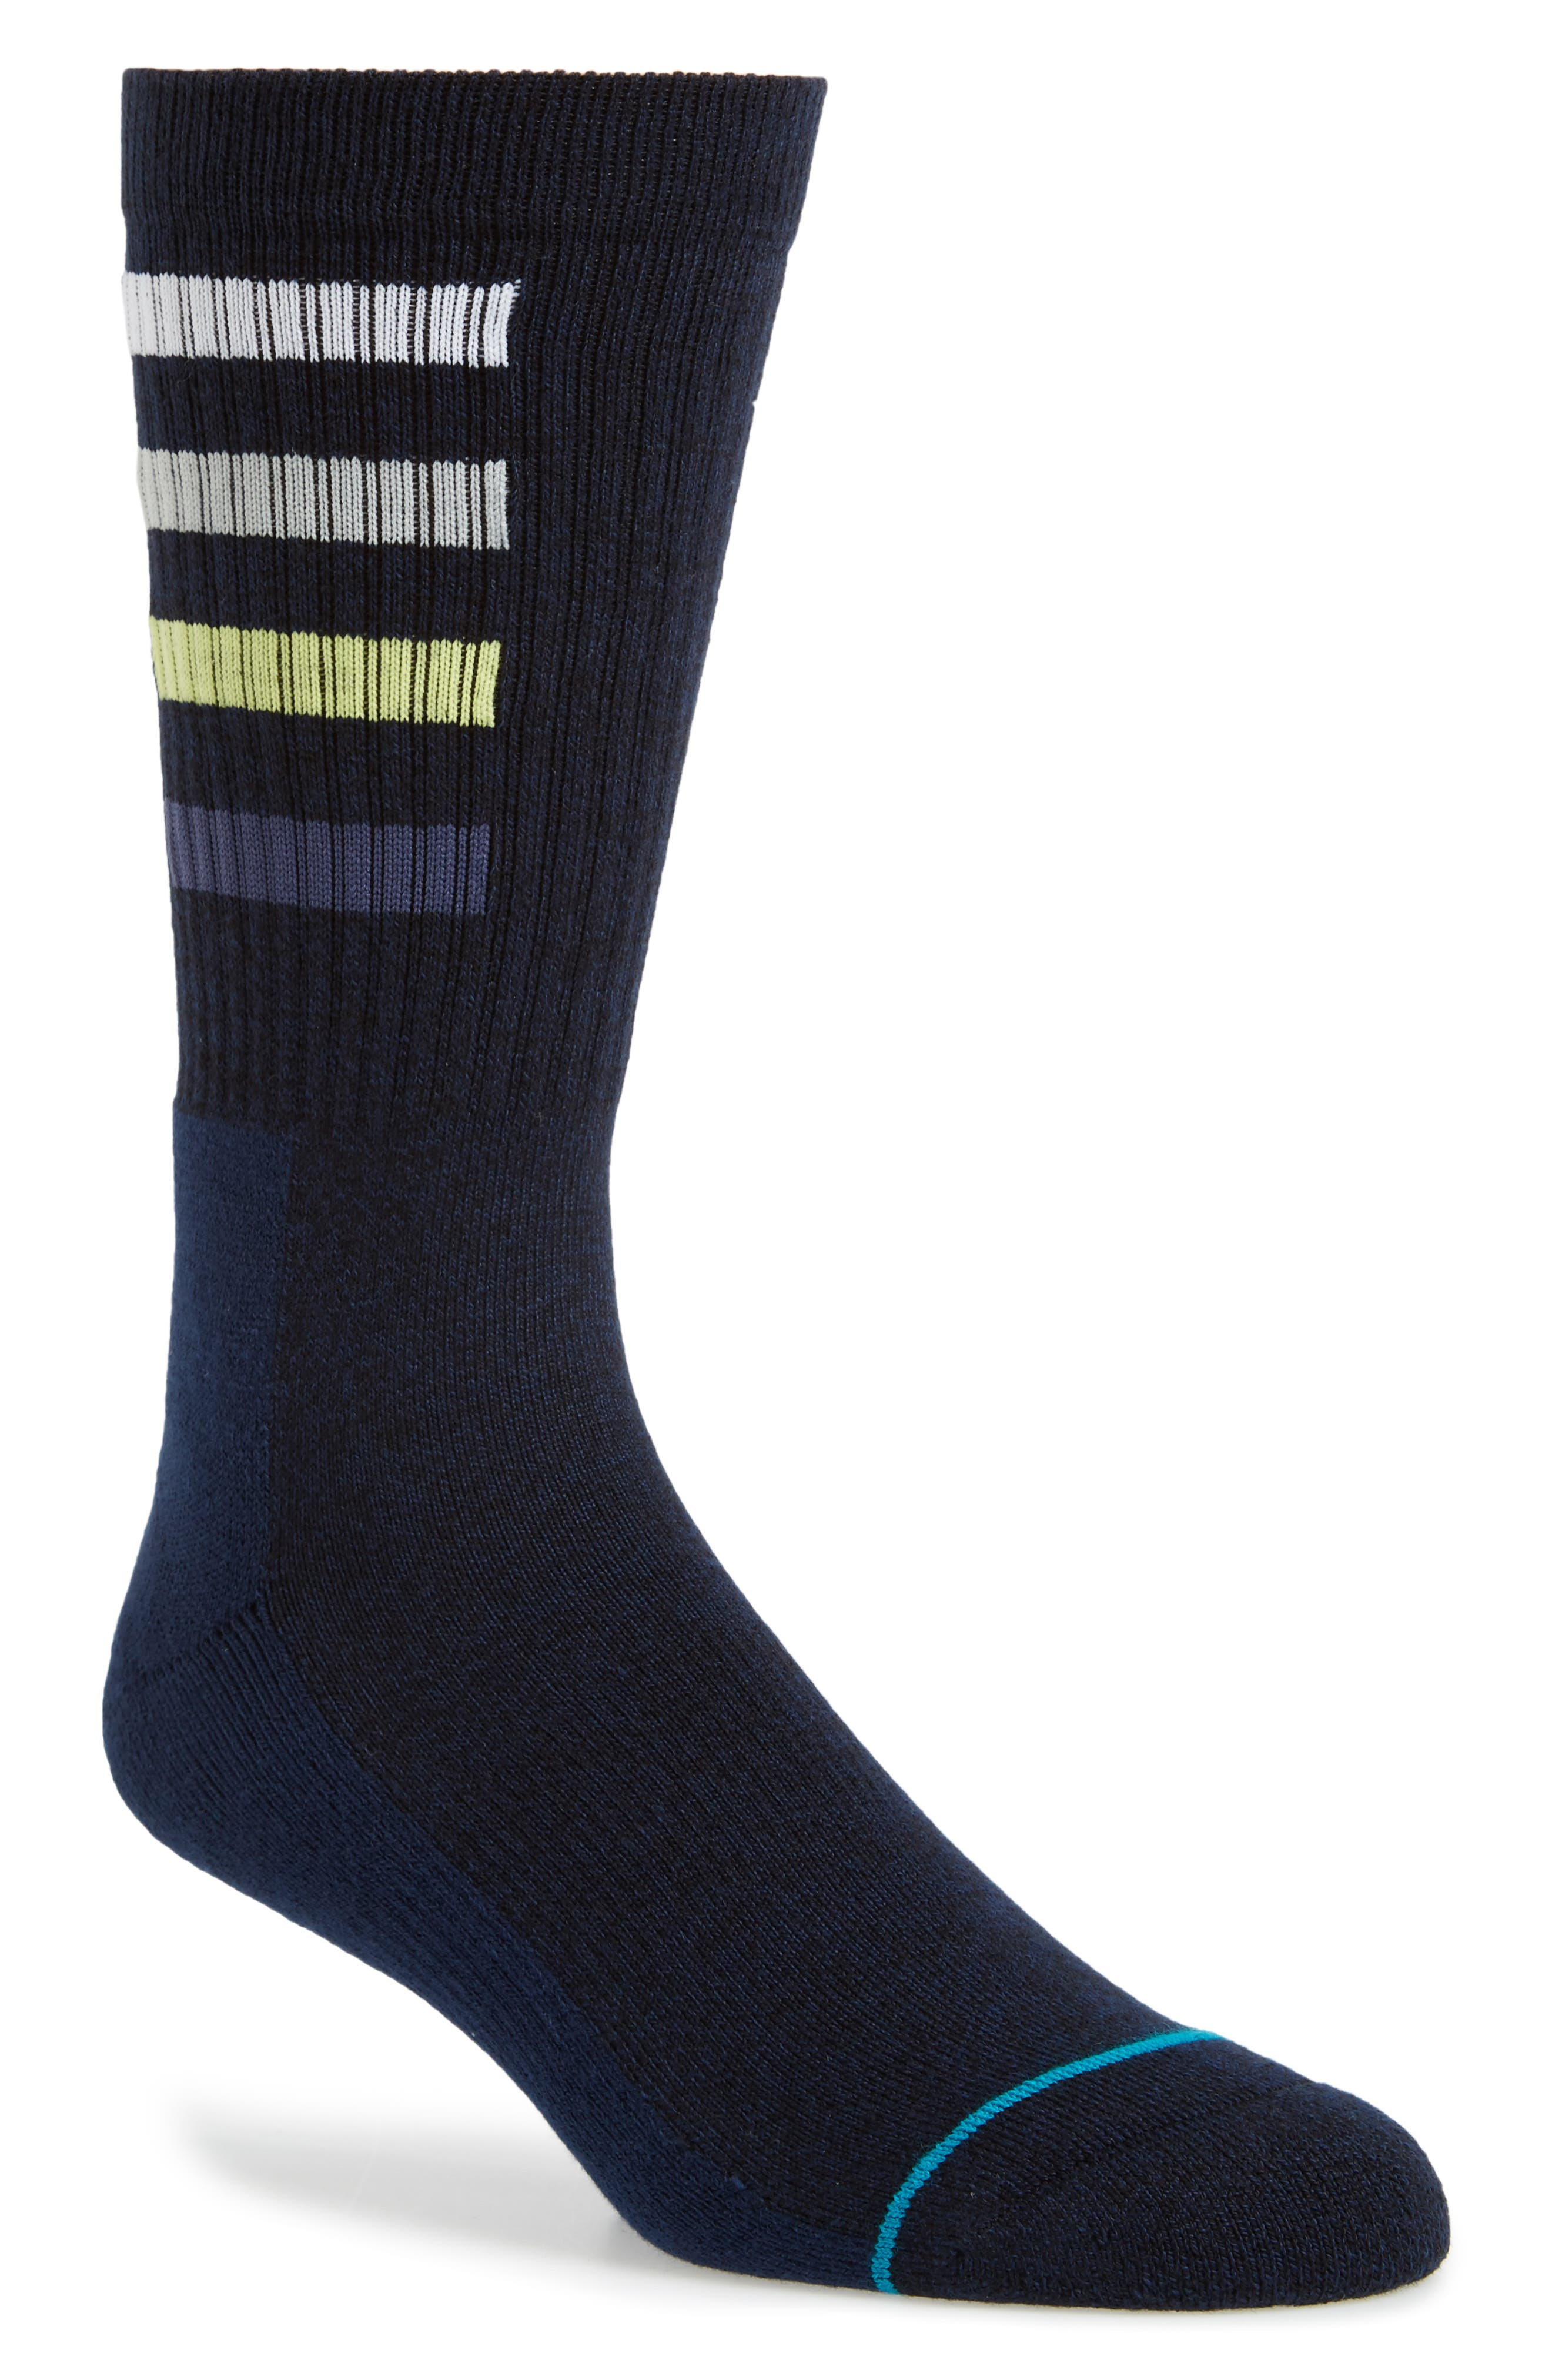 Stance Croton Crew Socks